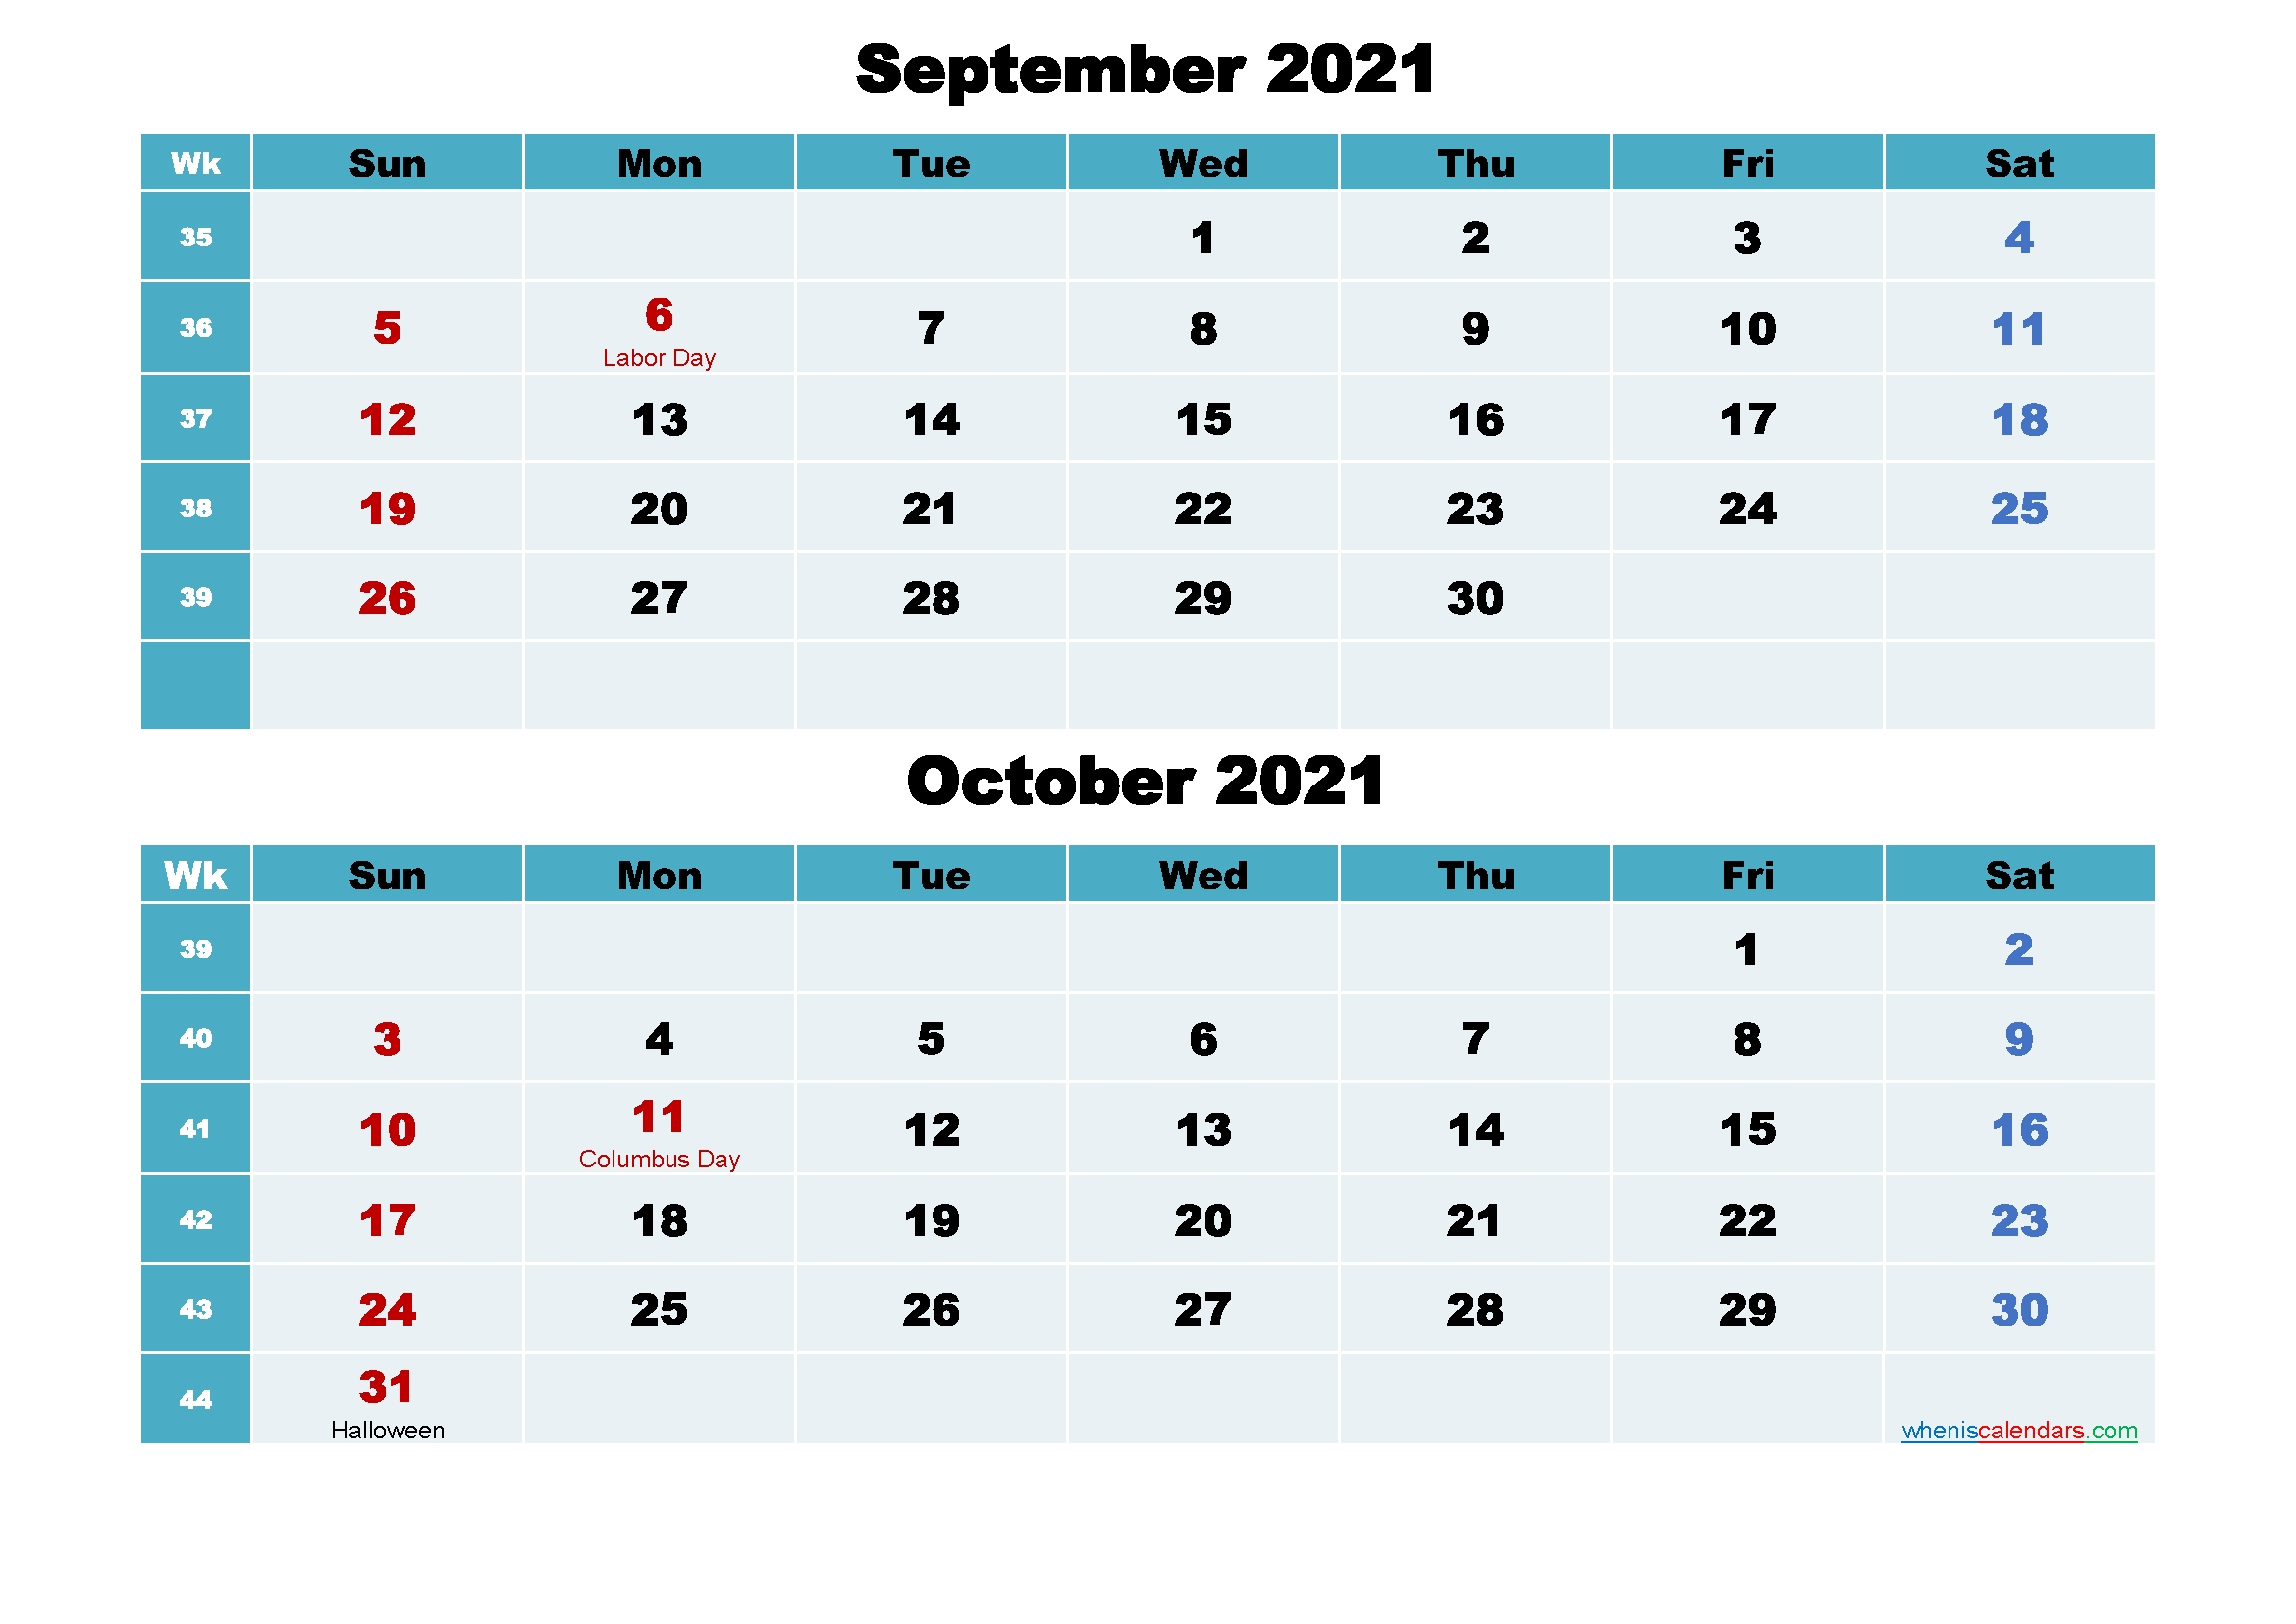 September And October 2021 Calendar With Holidays - Free Printable 2020 Monthly Calendar With October 2020 - September 2021 Calendar